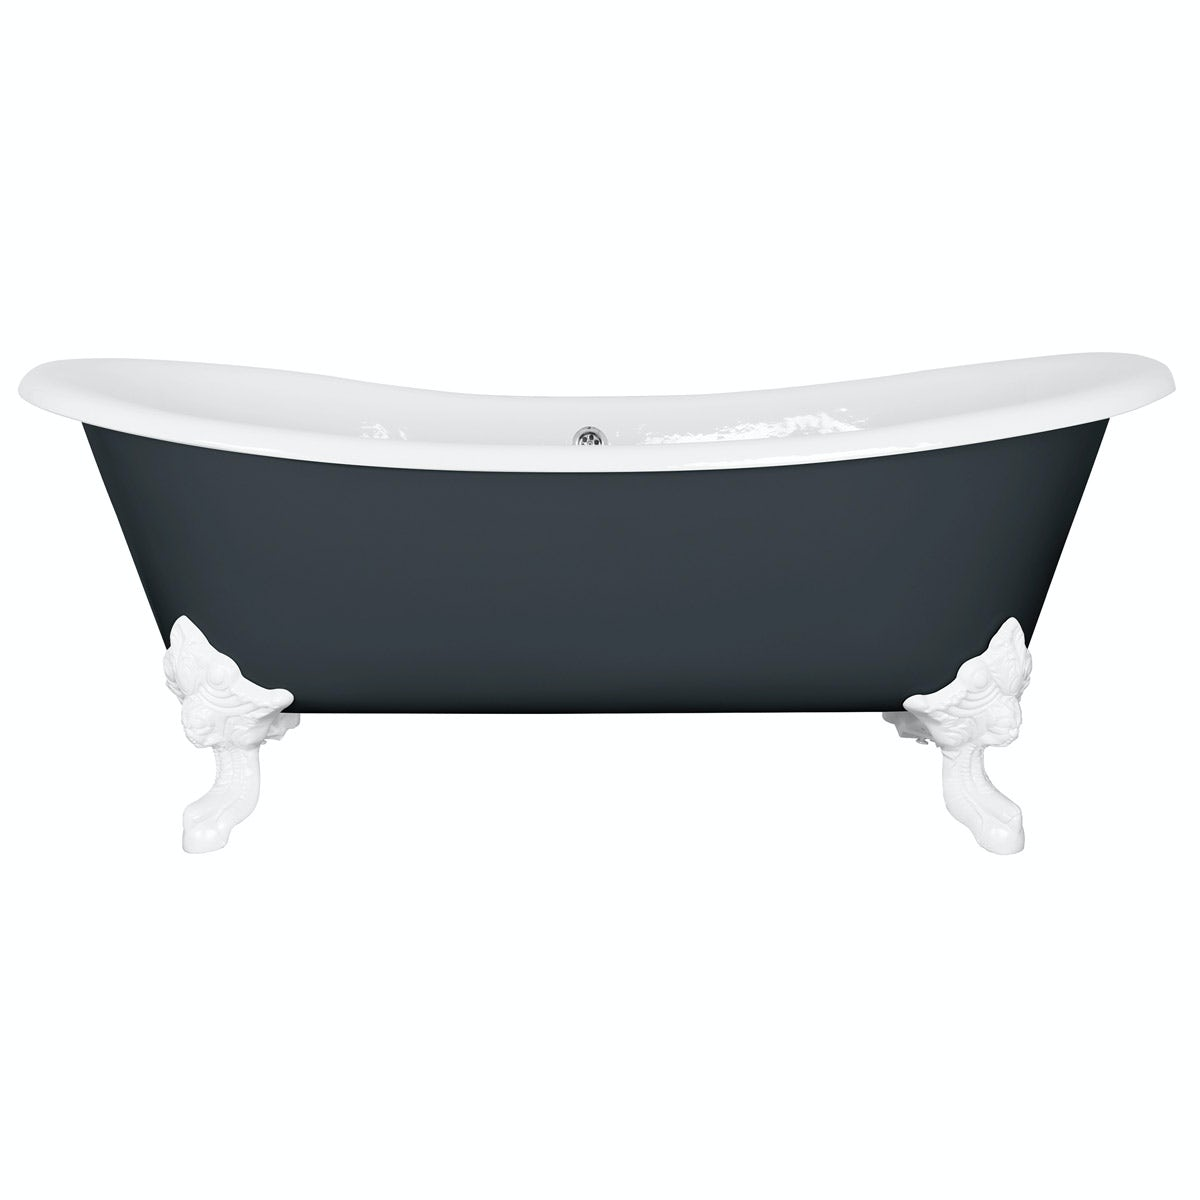 The Bath Co. Dover province blue cast iron bath